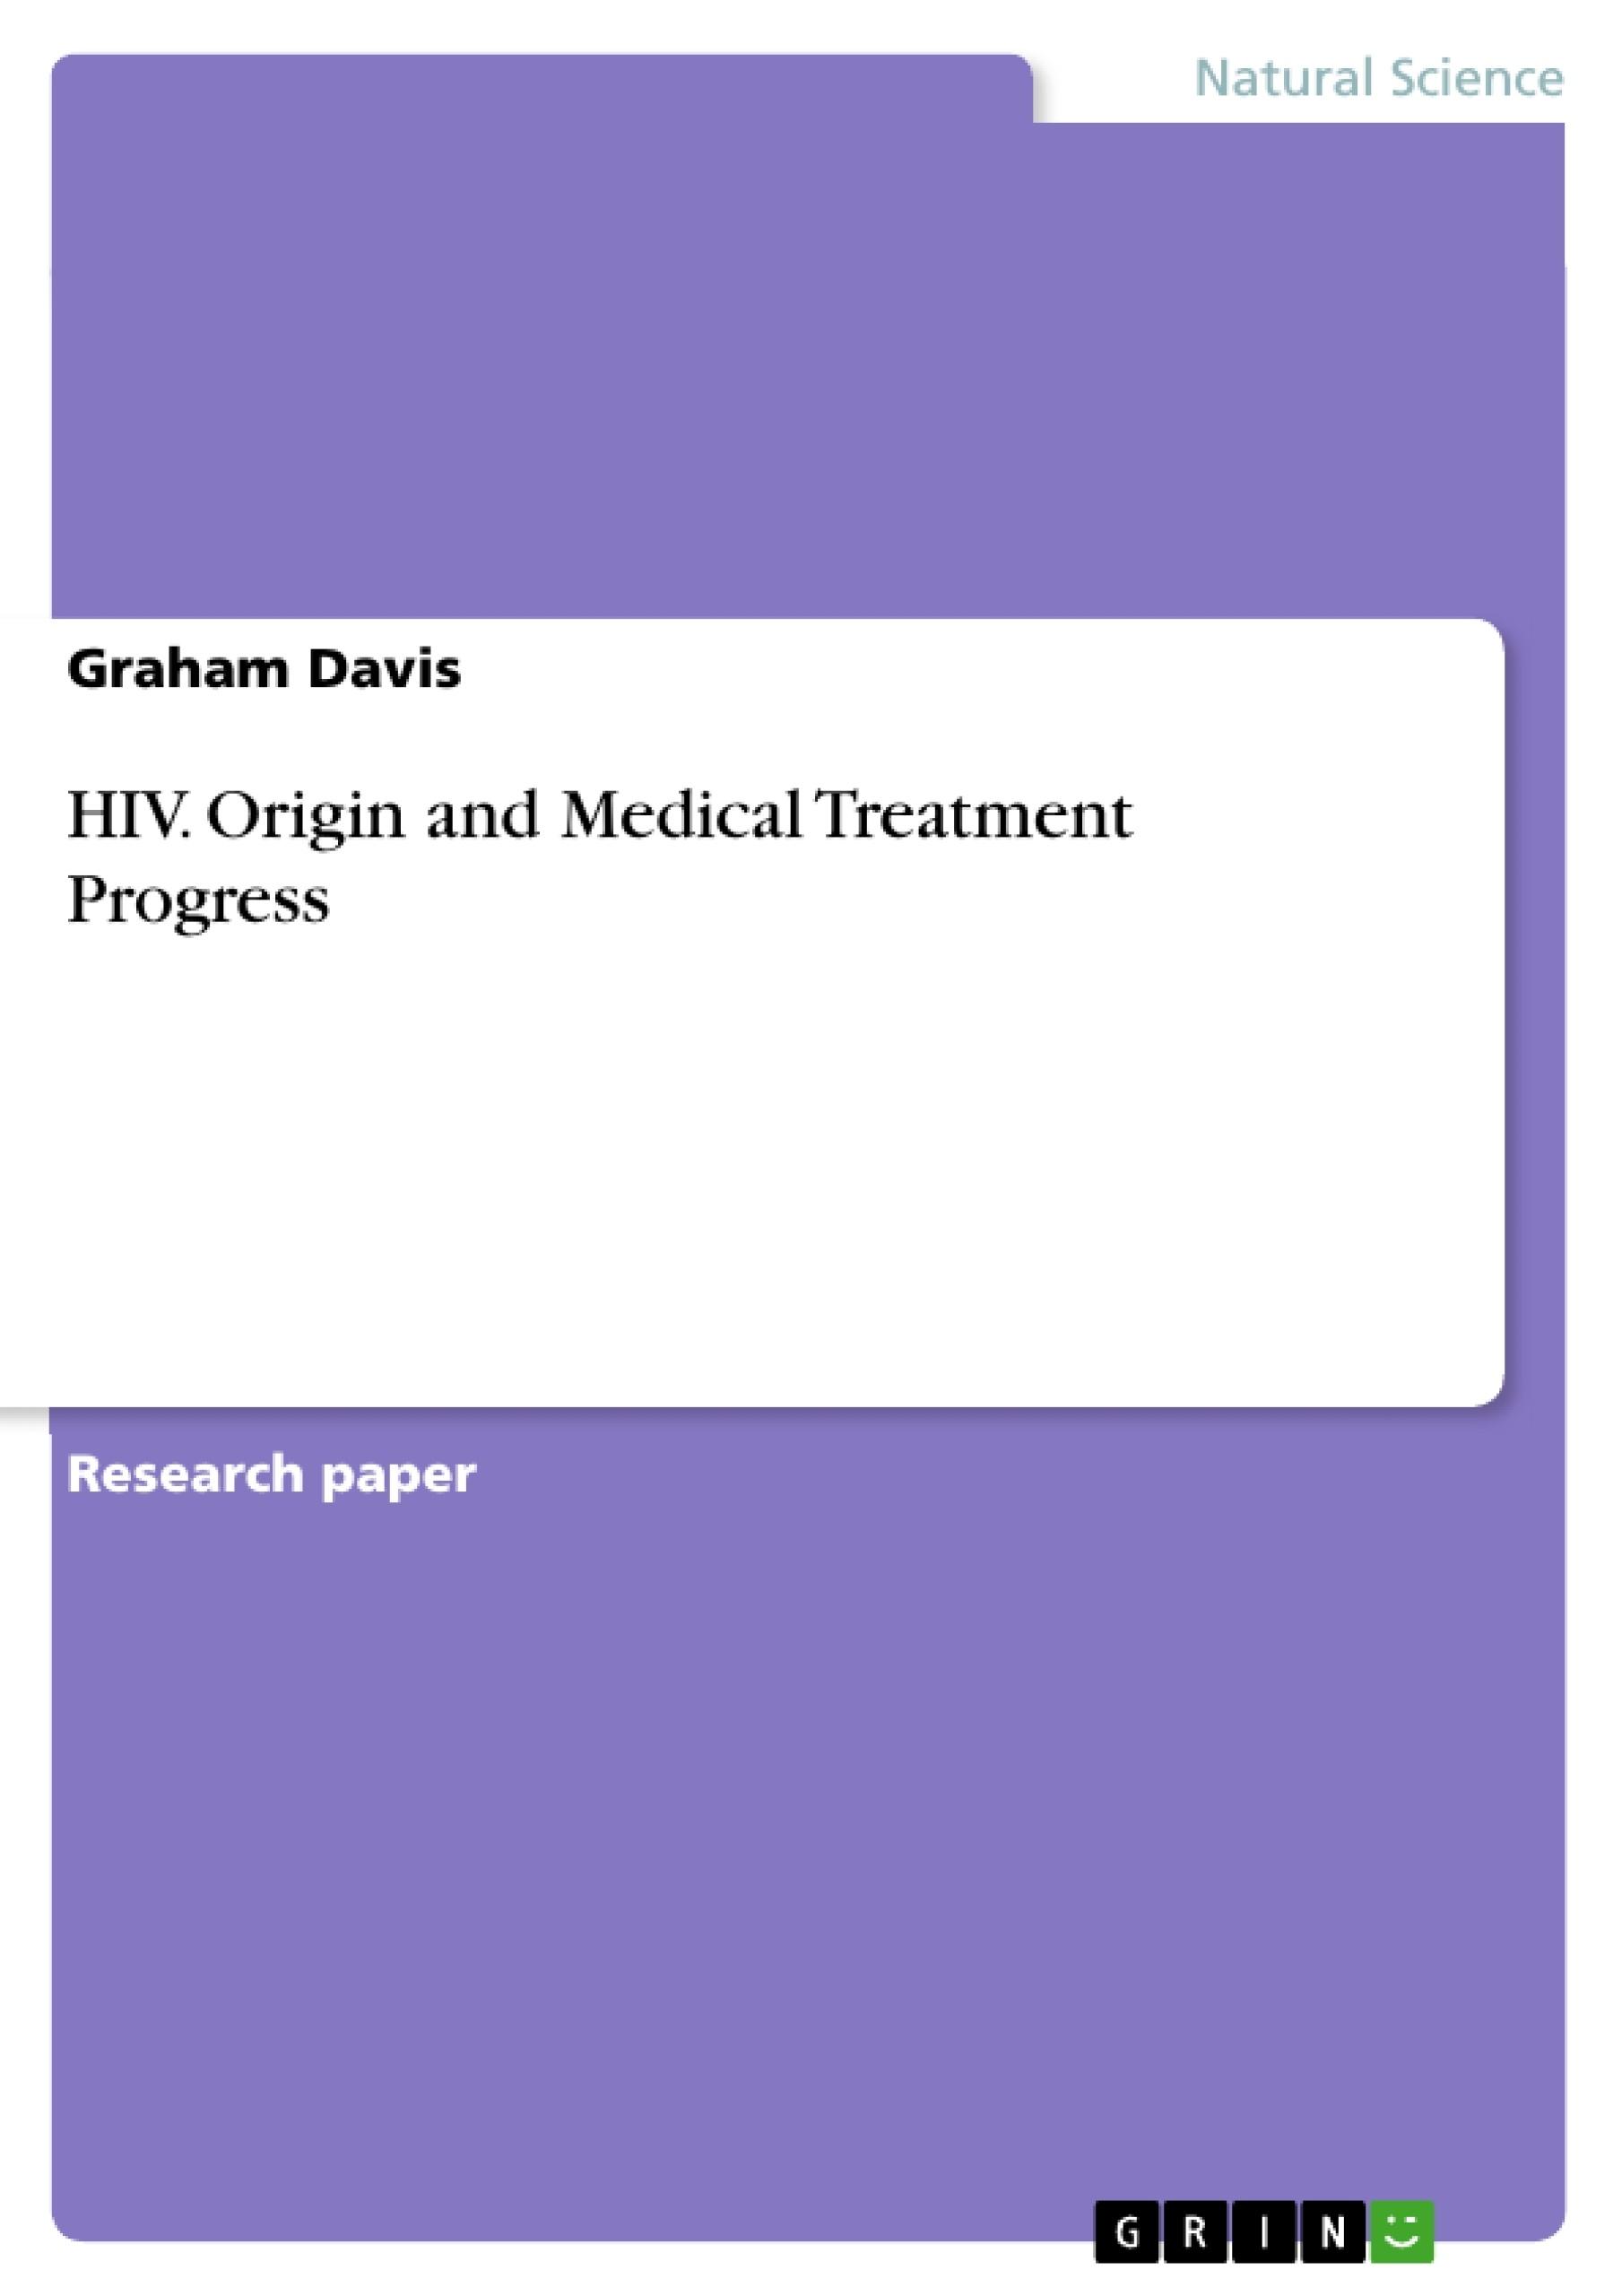 hiv origin and medical treatment progress  publish your